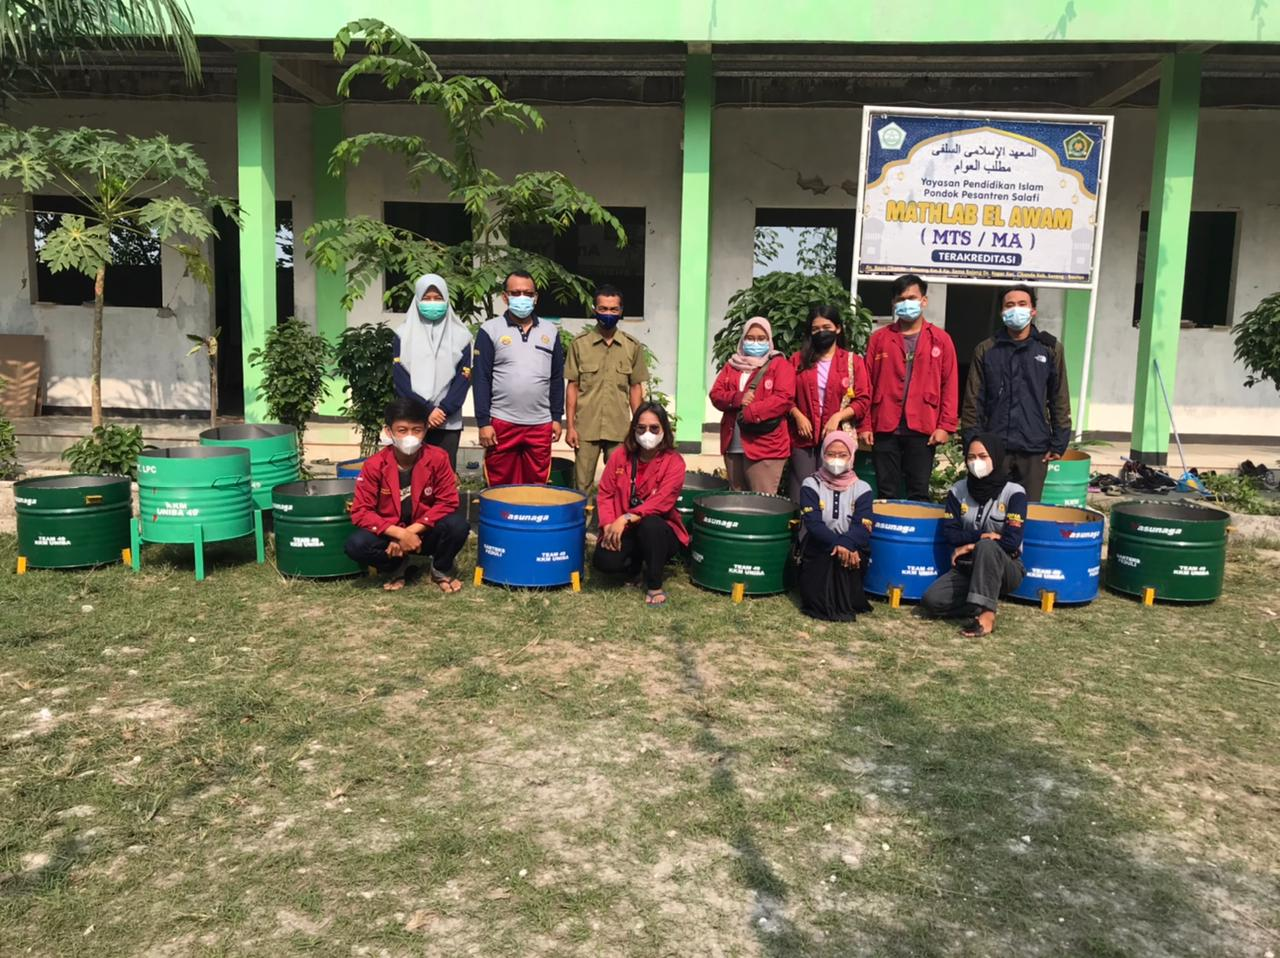 Gambar Garteks Peduli Serang Gandeng KKM 49 Universitas Bina Bangsa Berikan Tong Sampah 15